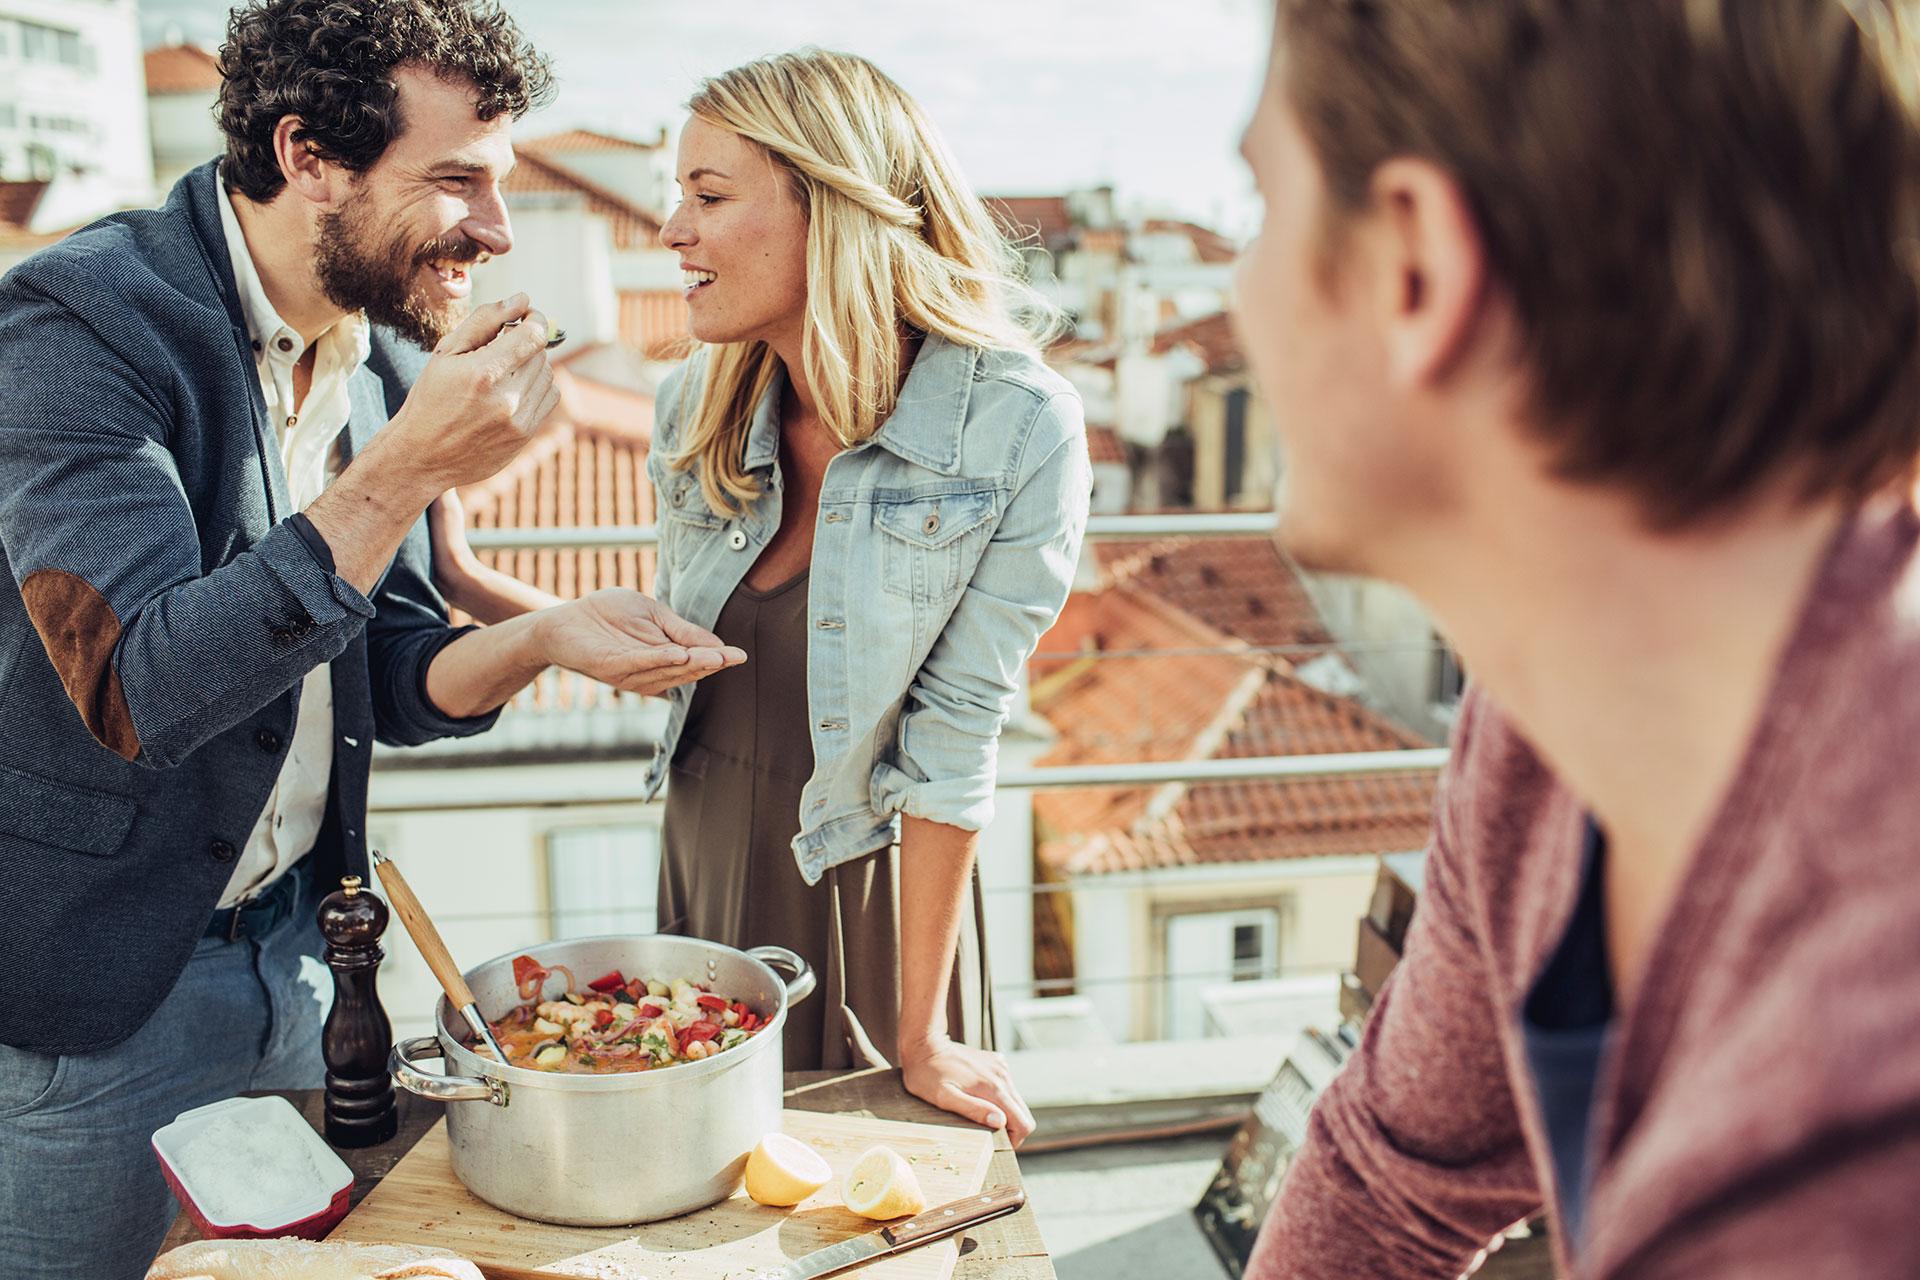 Lissabon Portugal Rooftop Lifestyle People Fotoproduktion Food Kochen Essen Michael Müller